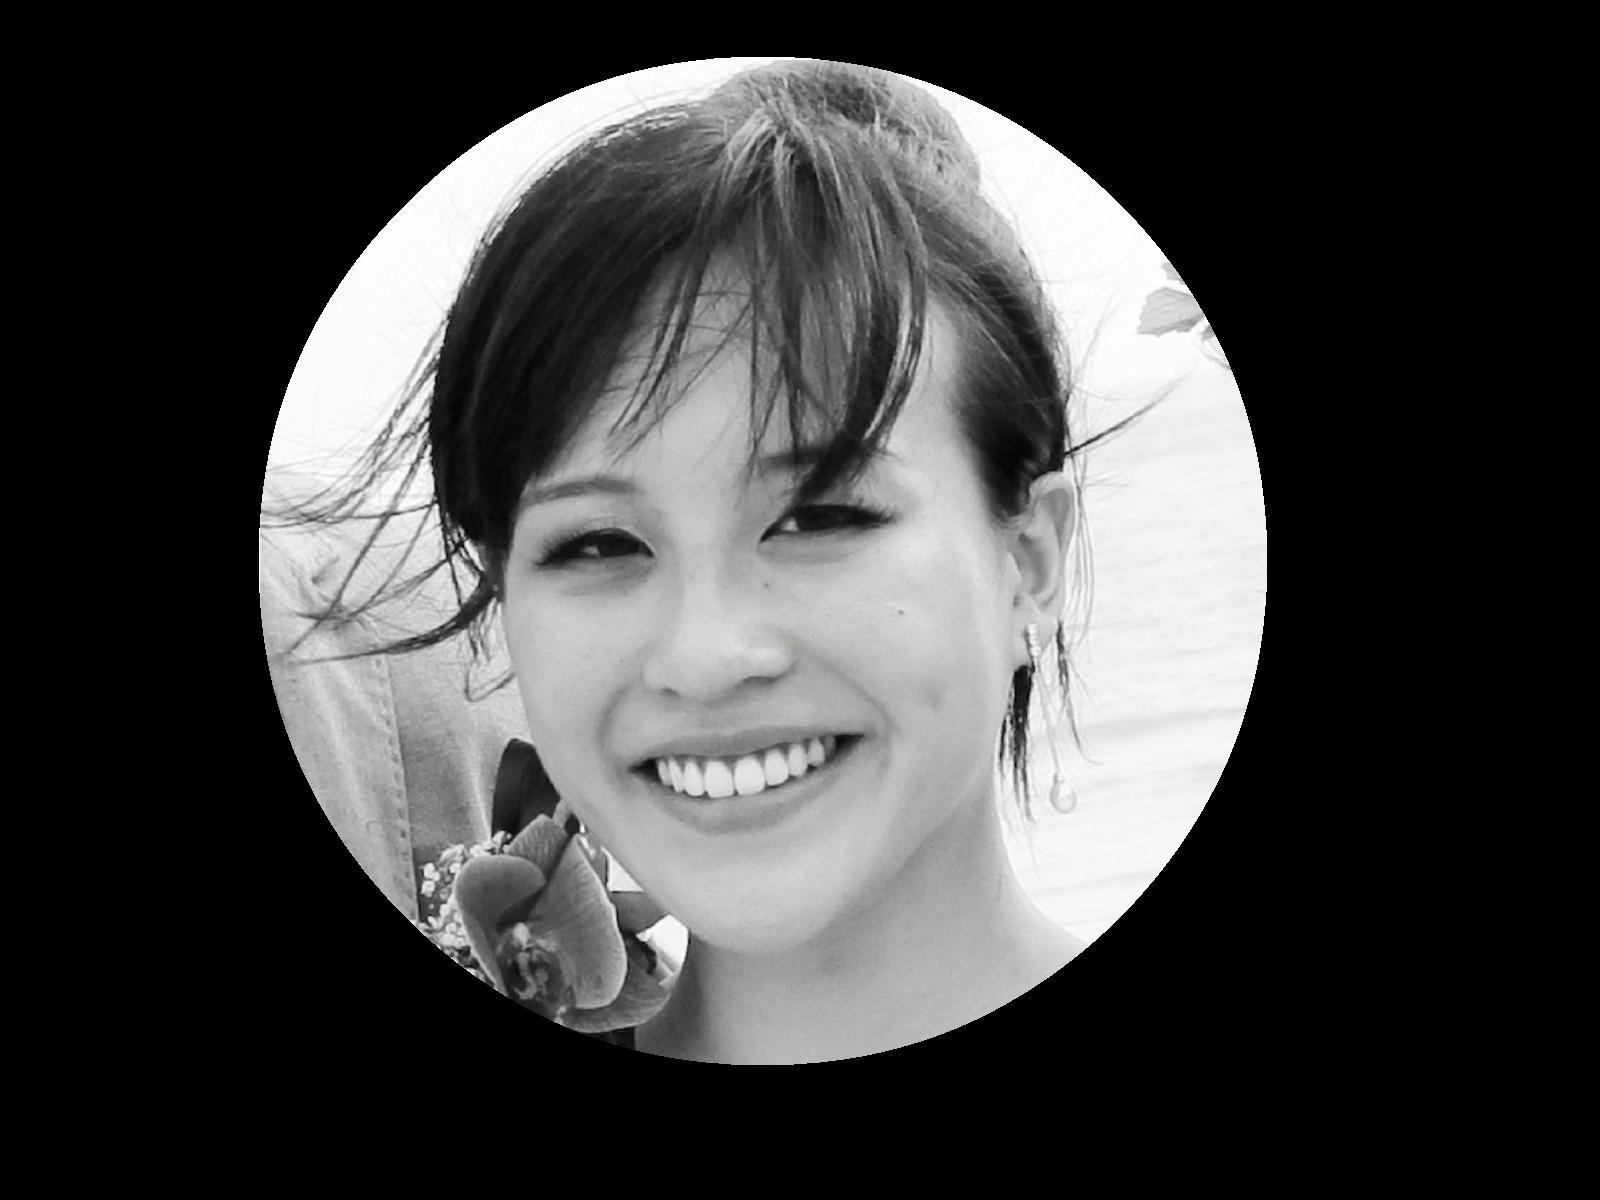 Meet Your Instructor! - Lynn Jackson-Taylor, BSc(Hons), BA(Hons), Dip(KHG), Dip(SpM), Cert(APPI), Cert(APN), MCSP, HCPC, AMRCM